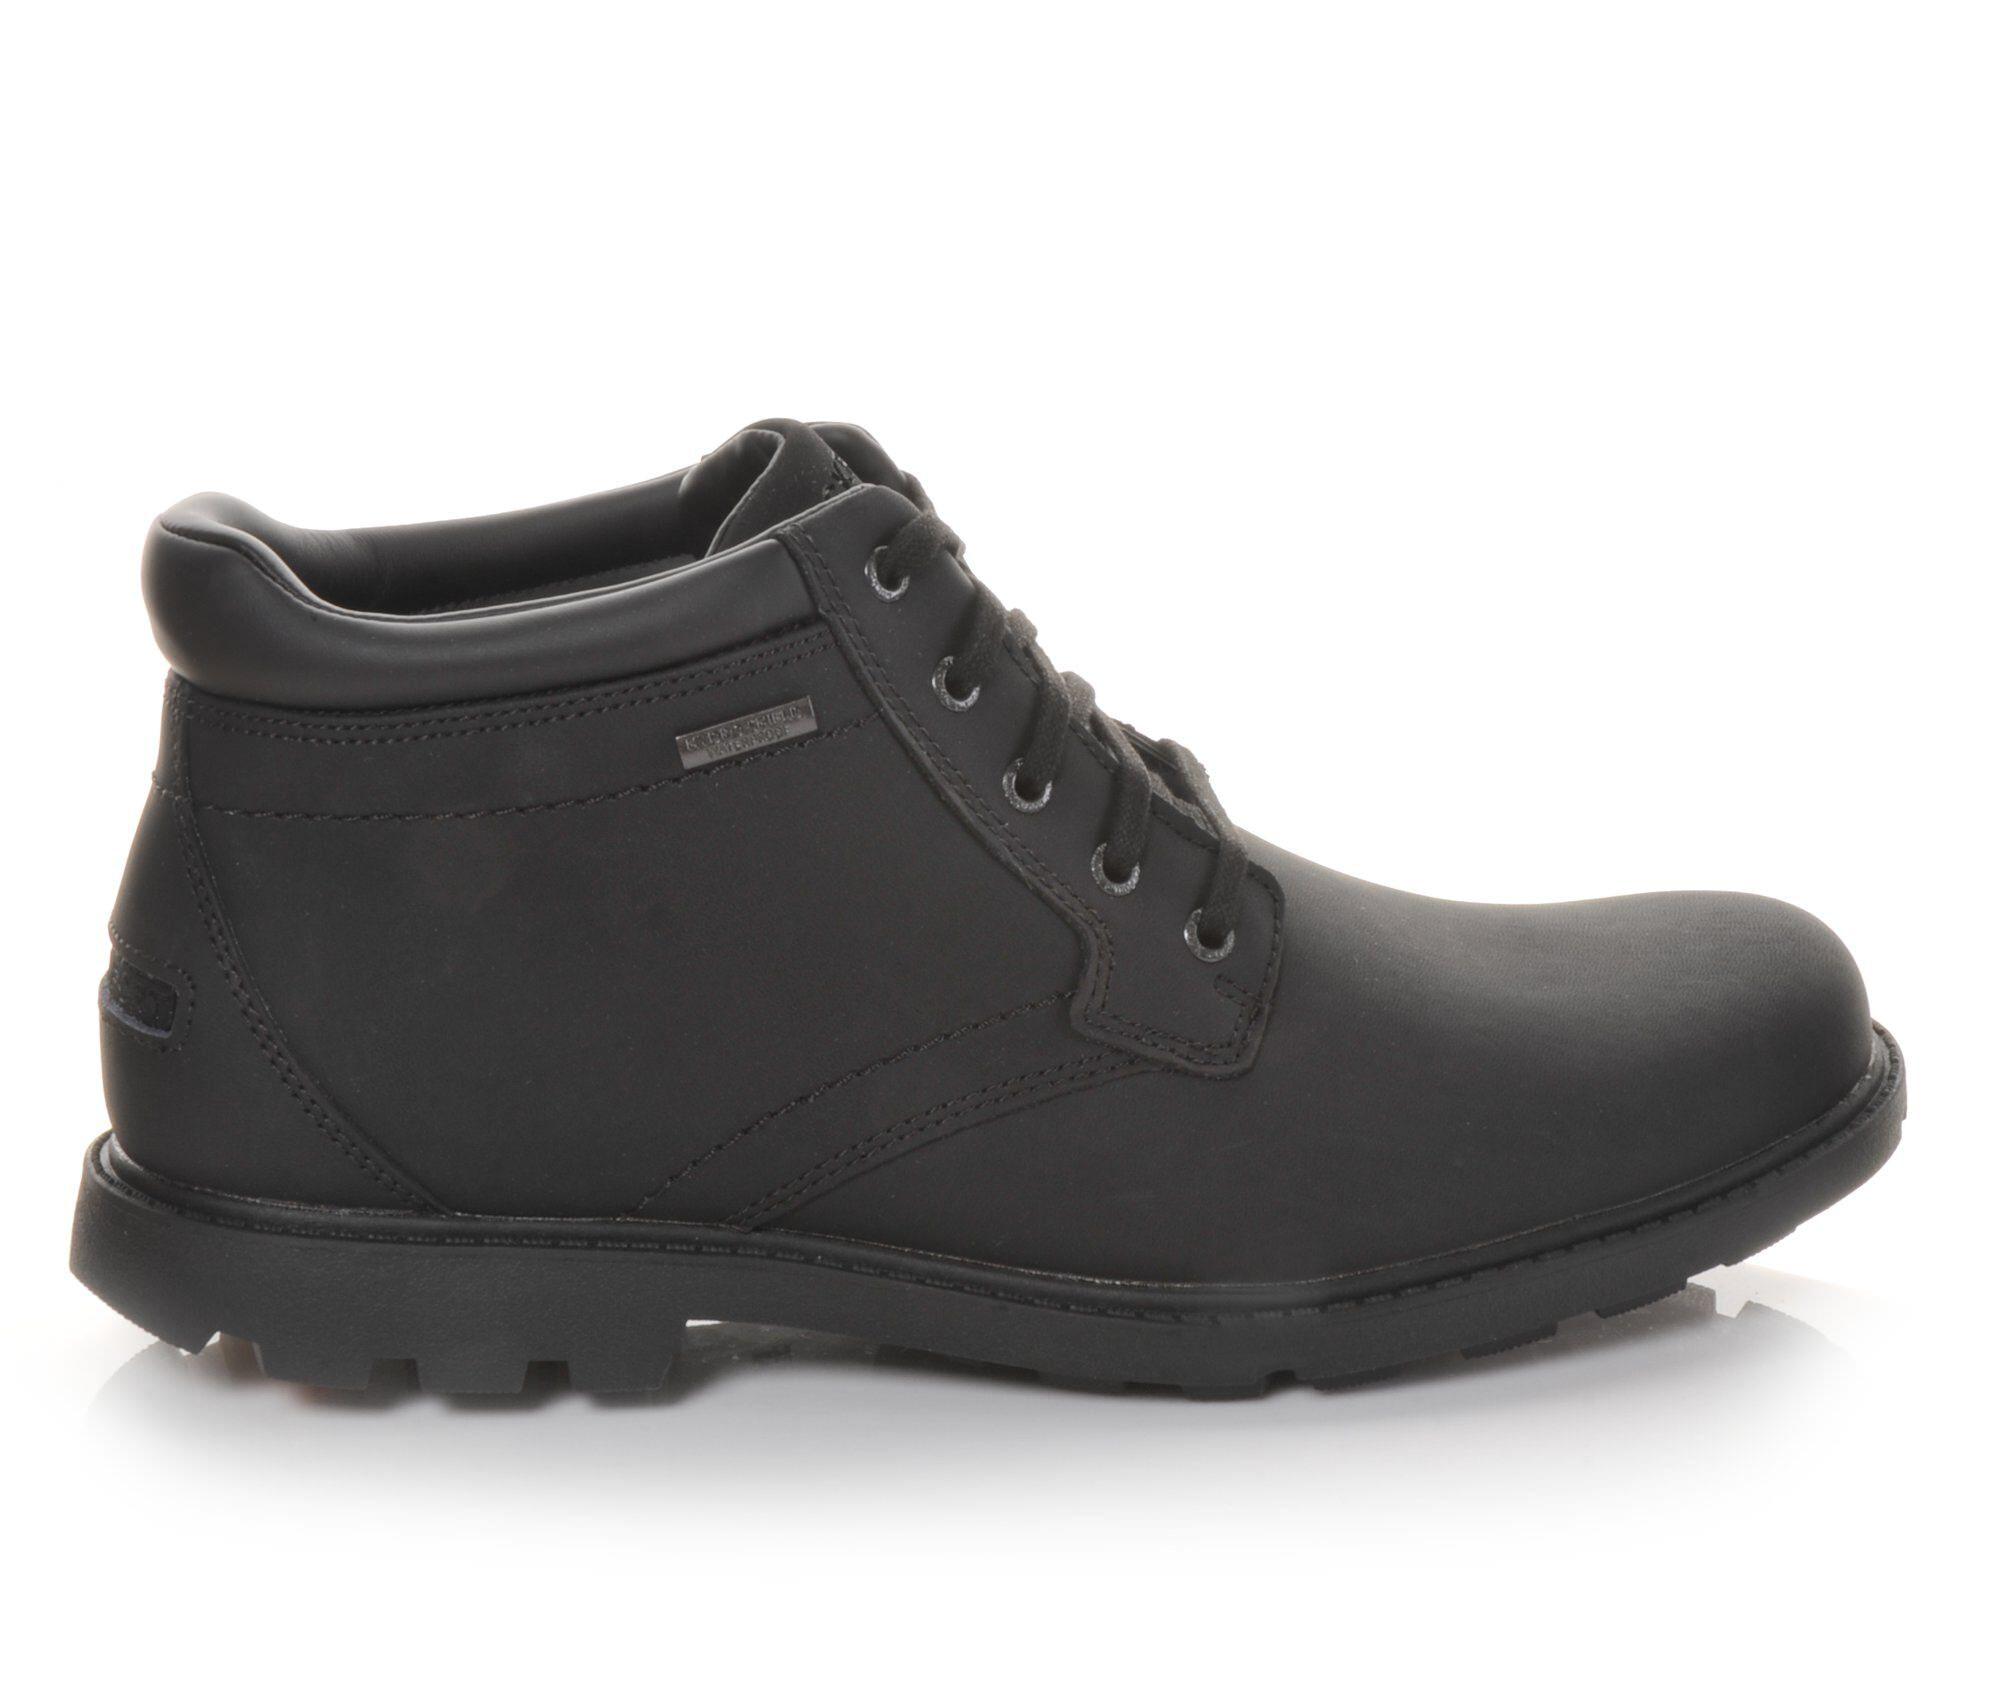 Exclusive Styles Men's Rockport Storm Surge Boots Black